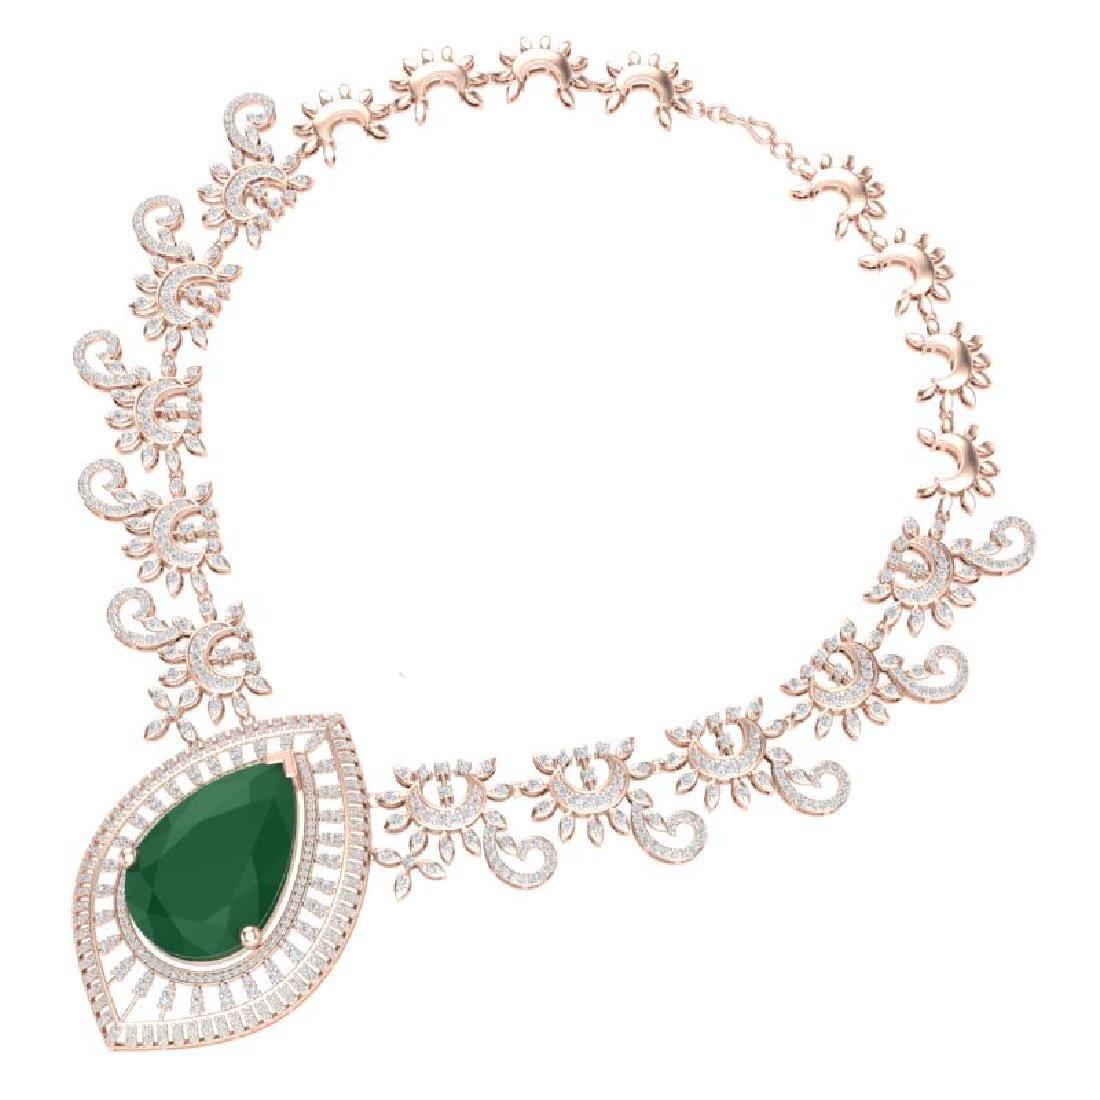 65.75 CTW Royalty Emerald & VS Diamond Necklace 18K - 2